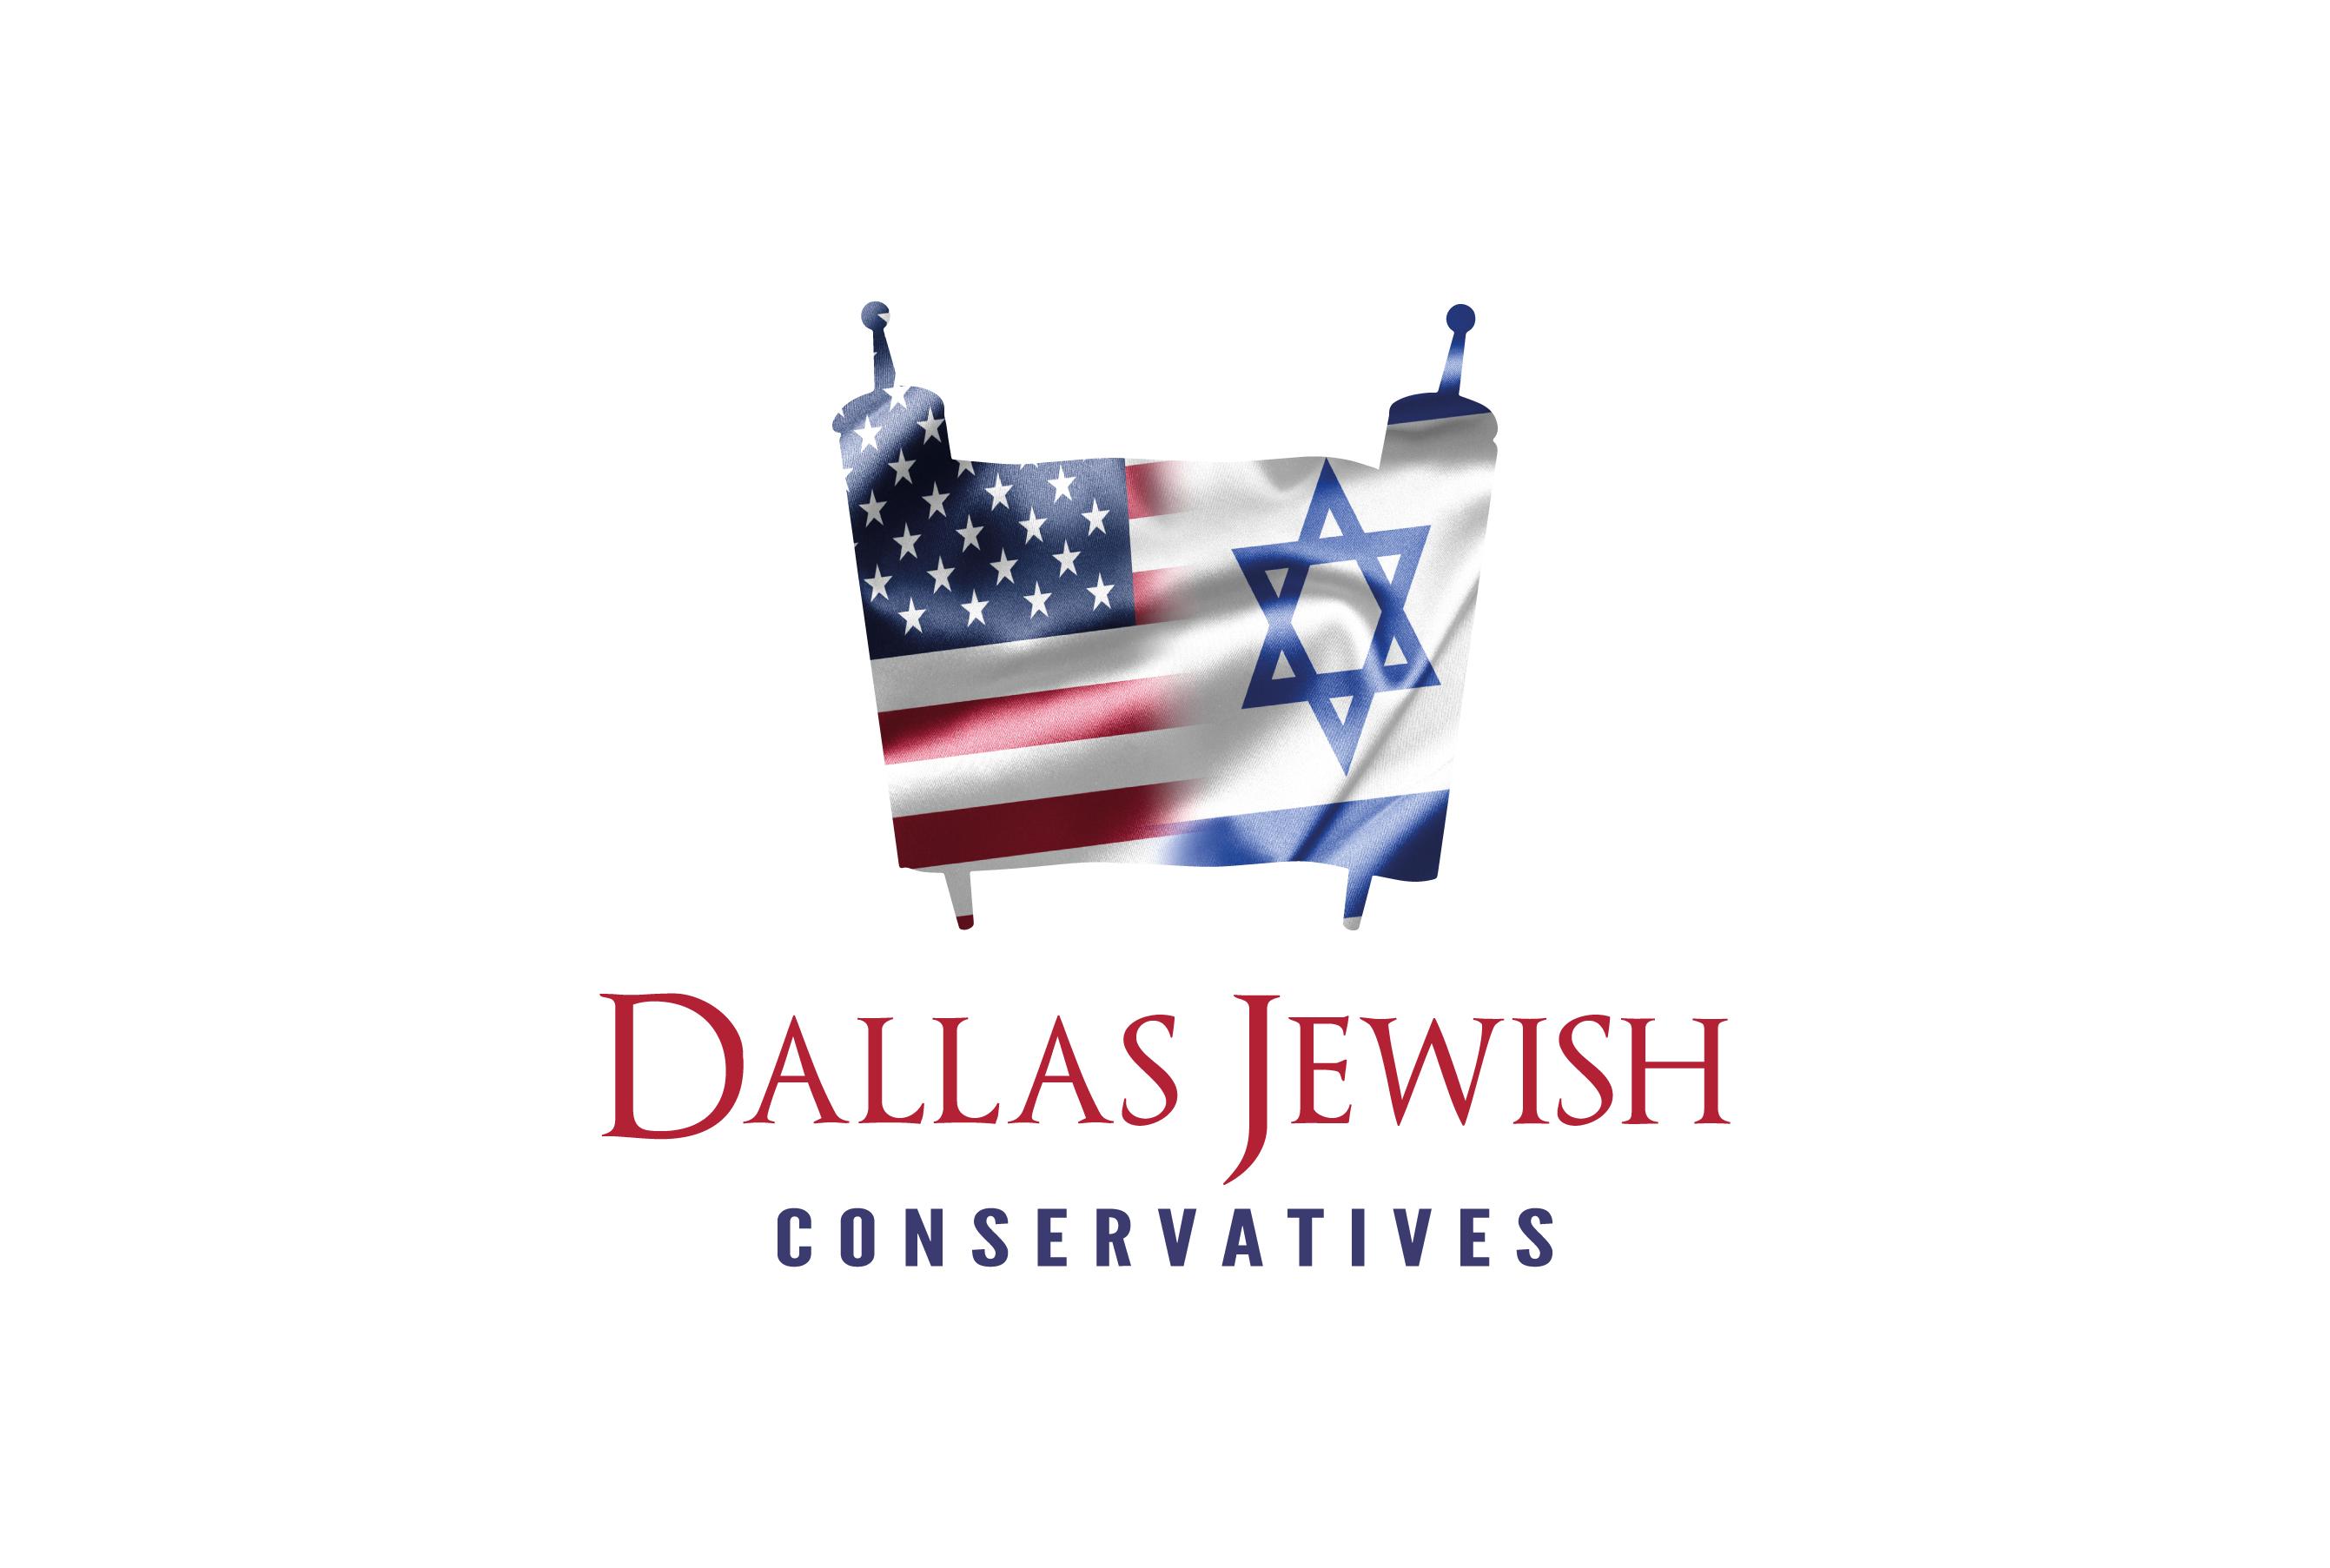 https://www.dallasjewishconservatives.com/